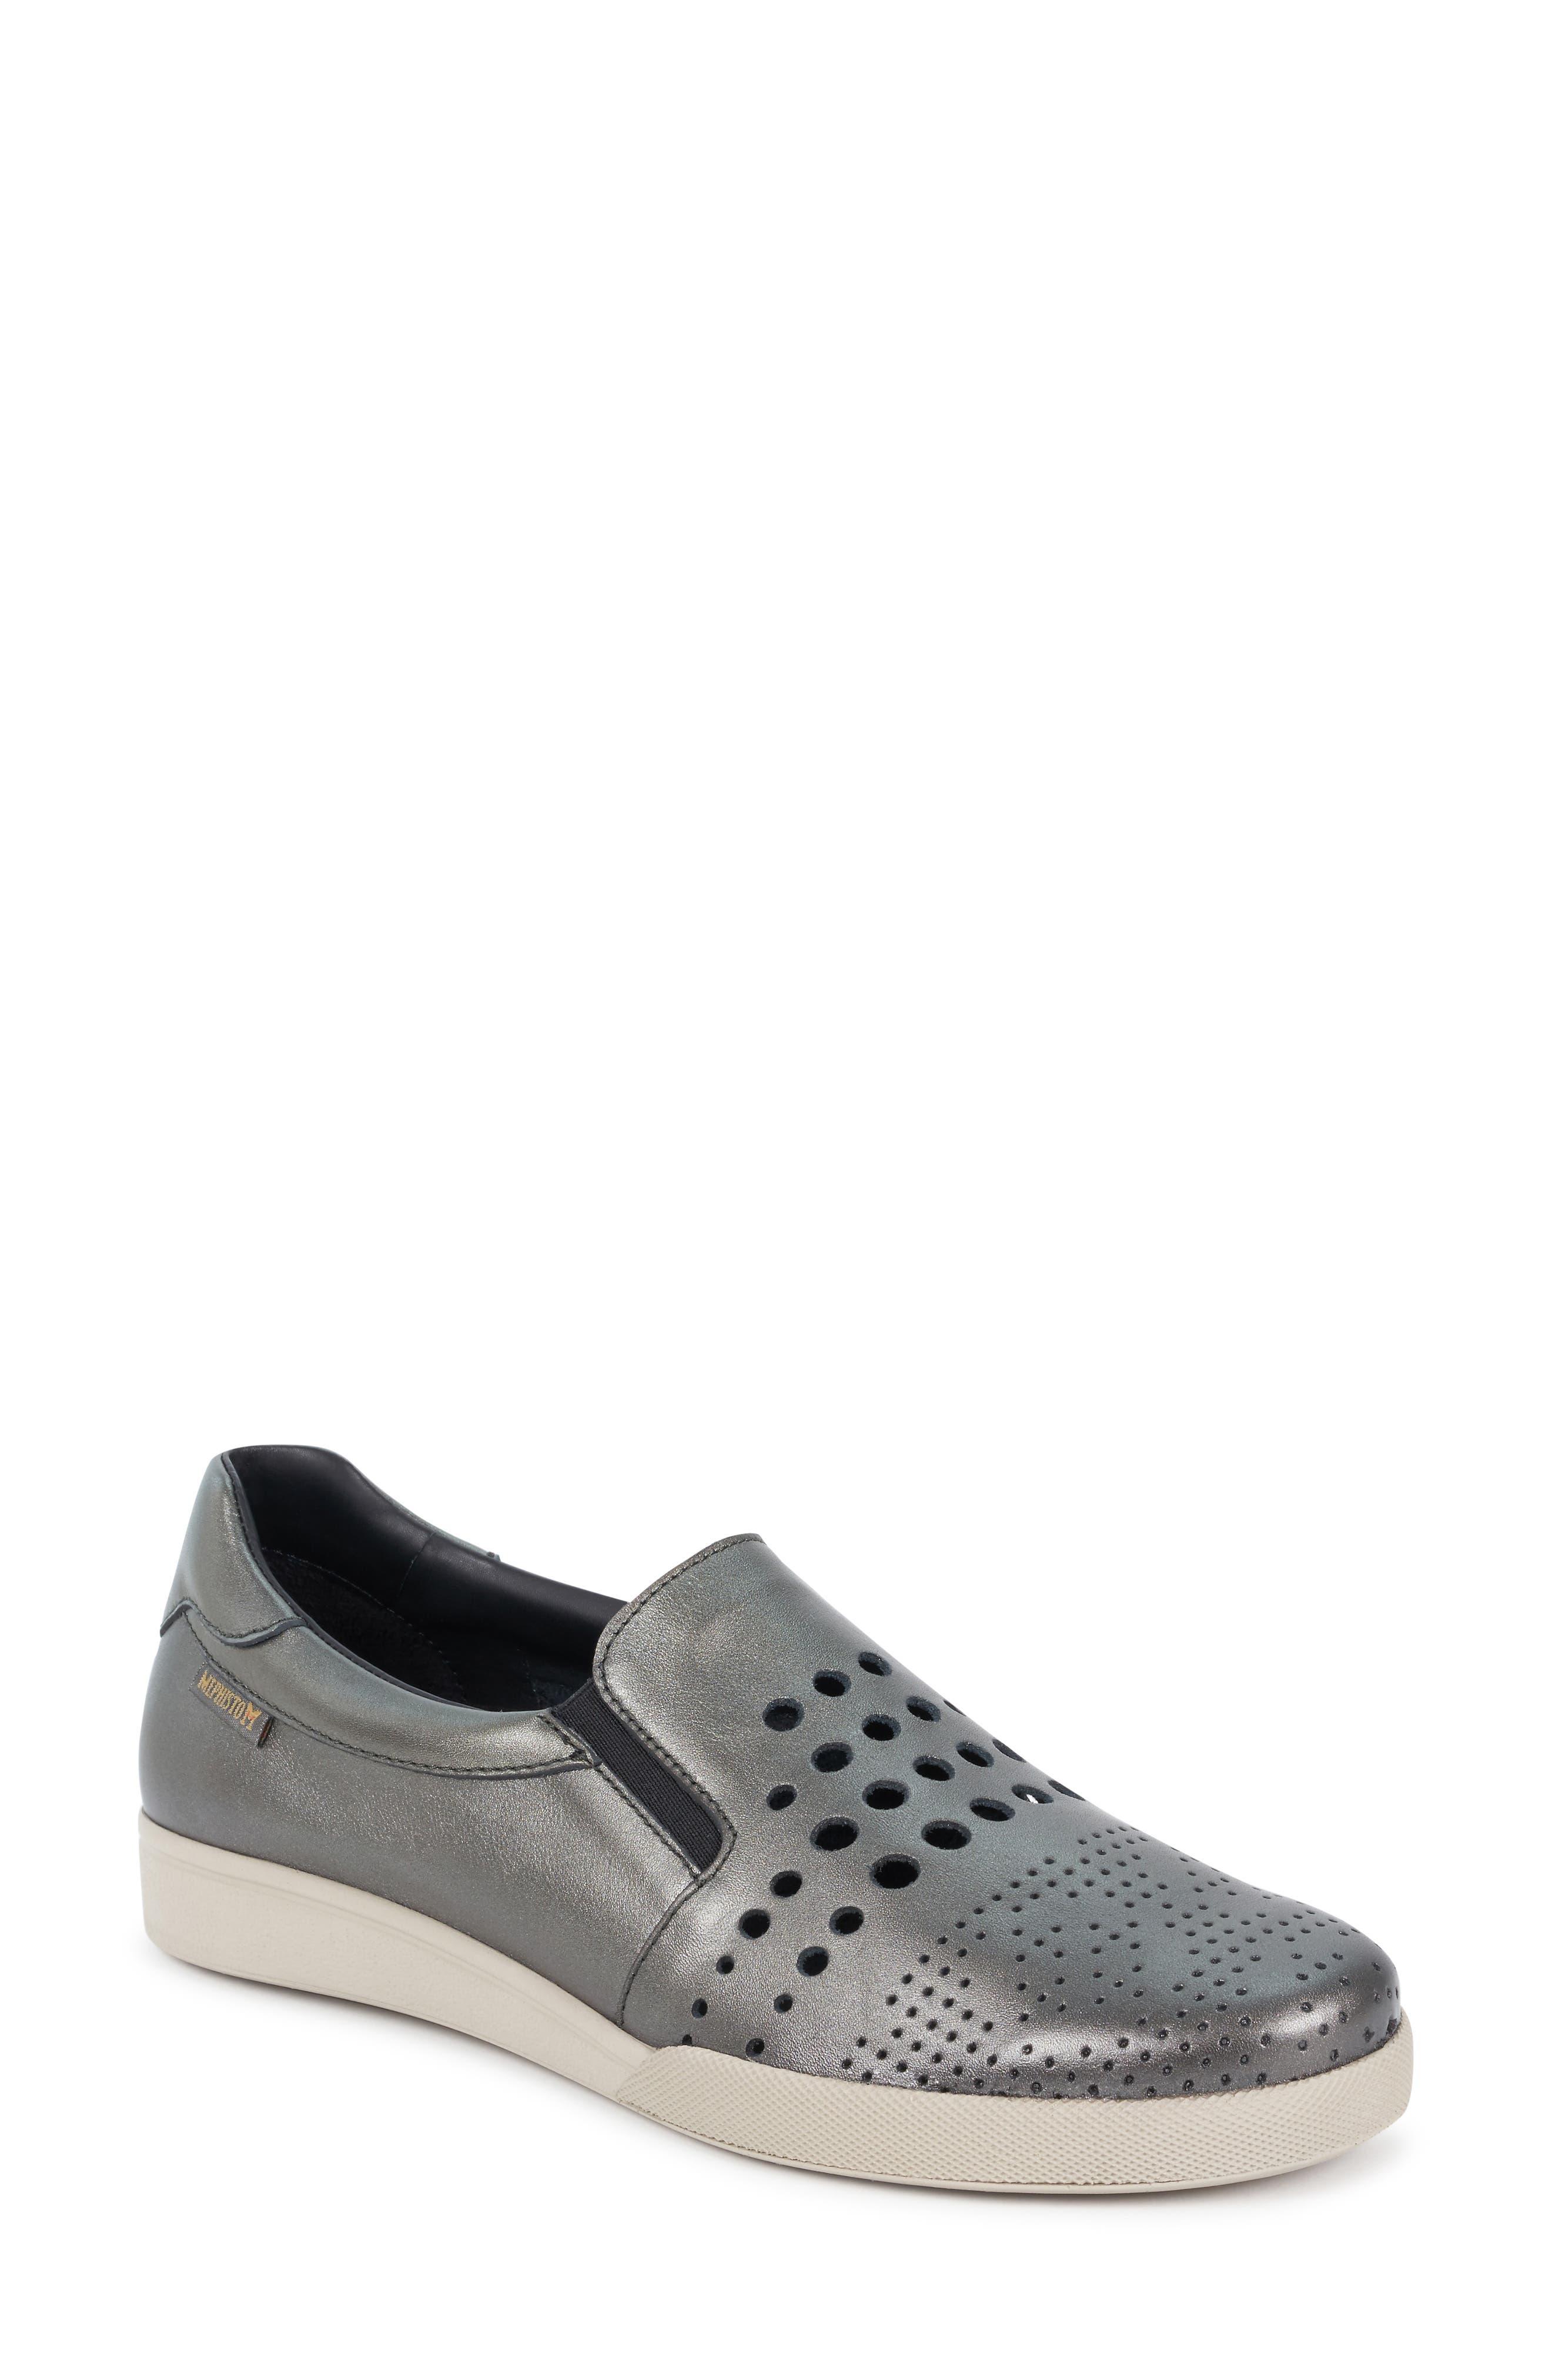 Doroty Perforated Slip-On Sneaker 9